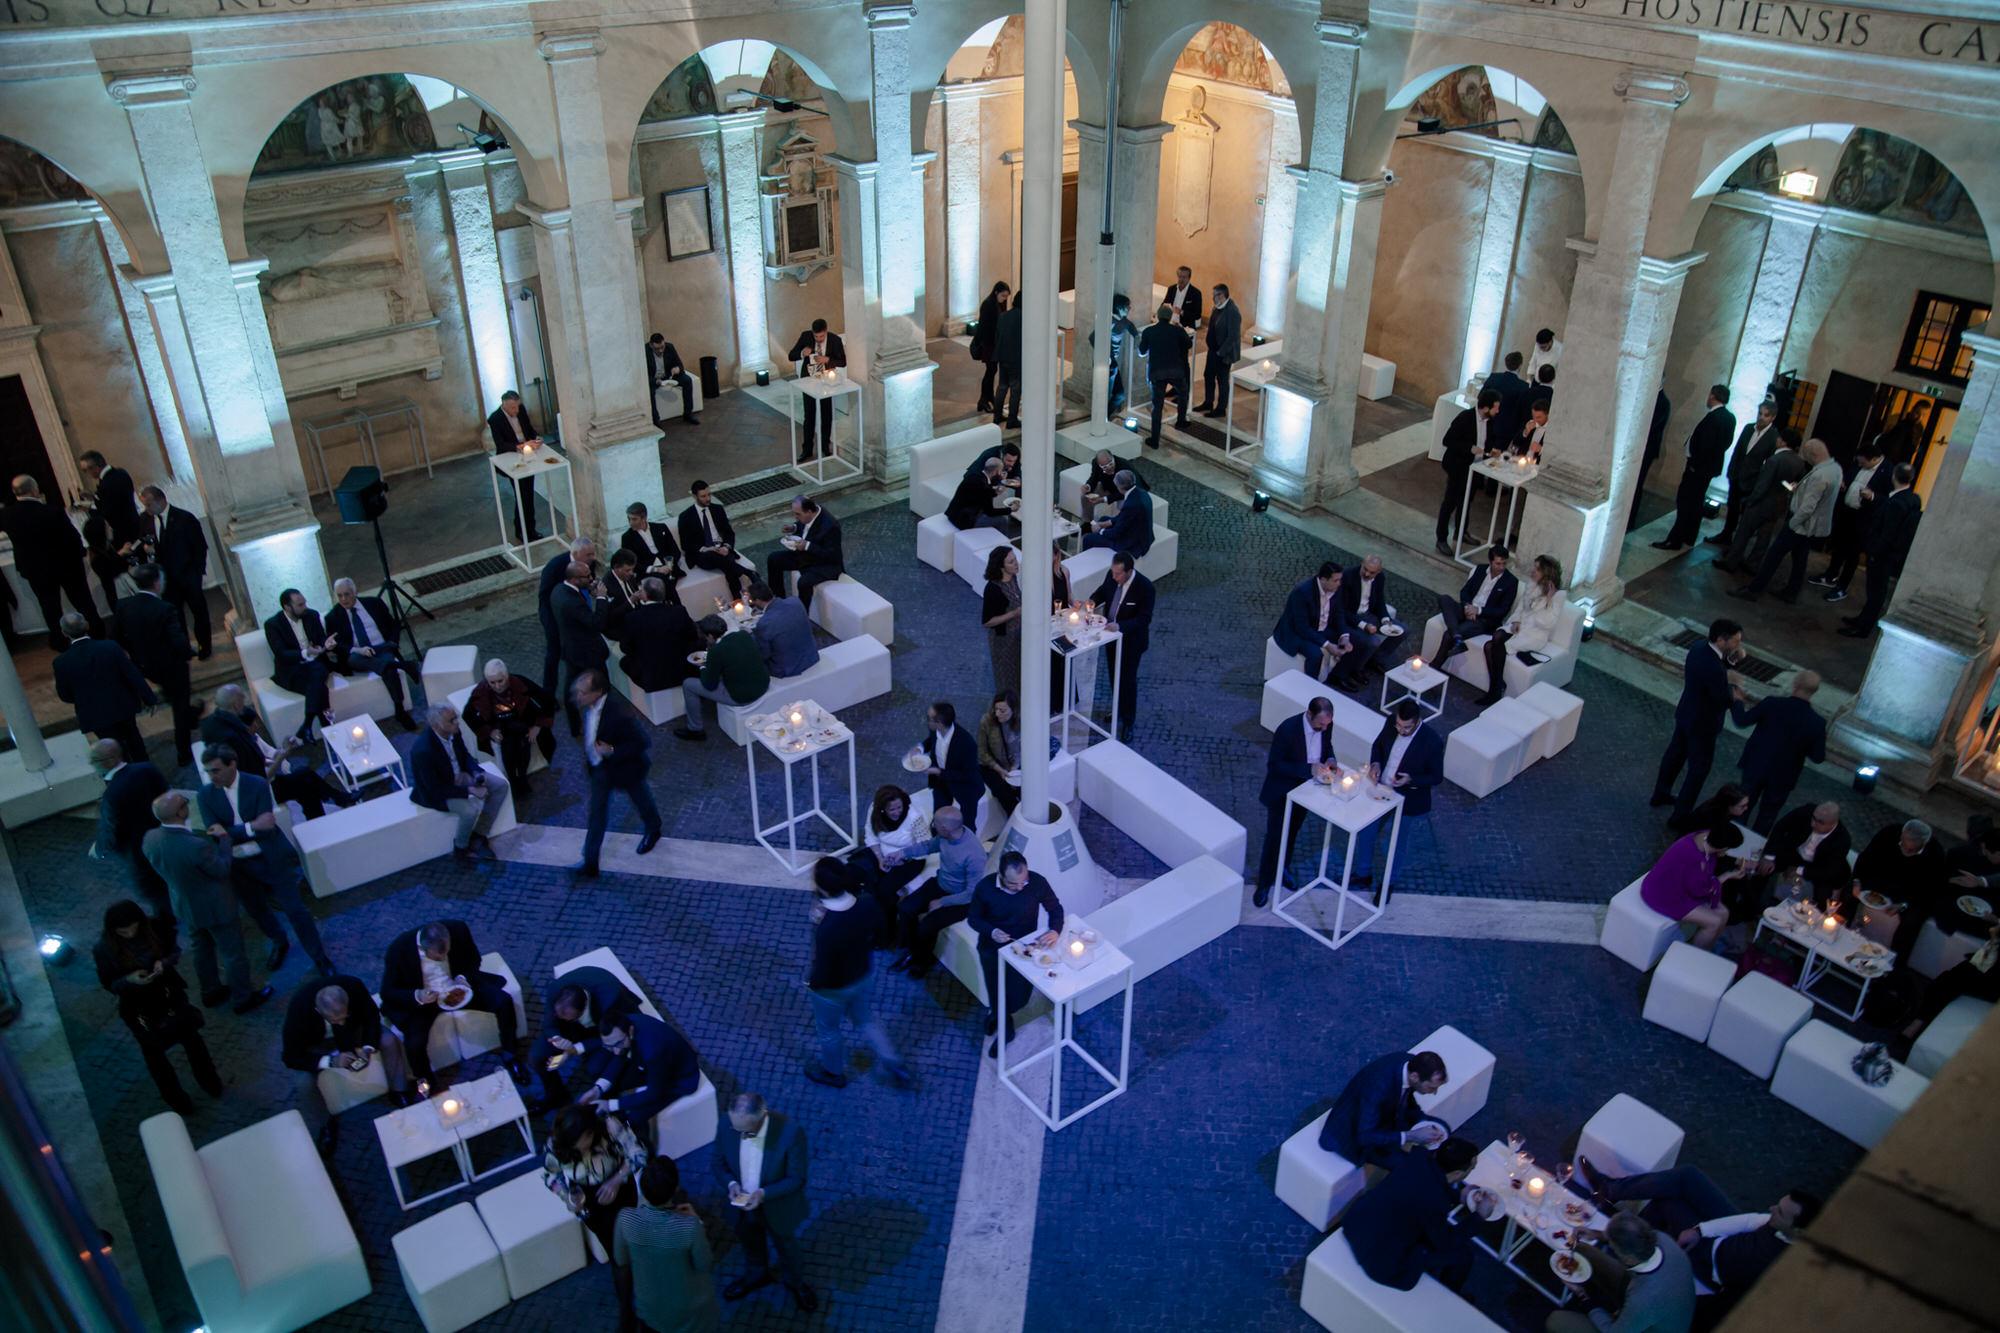 car-vans-dealer-convention-gruppo-peroni-eventi-09